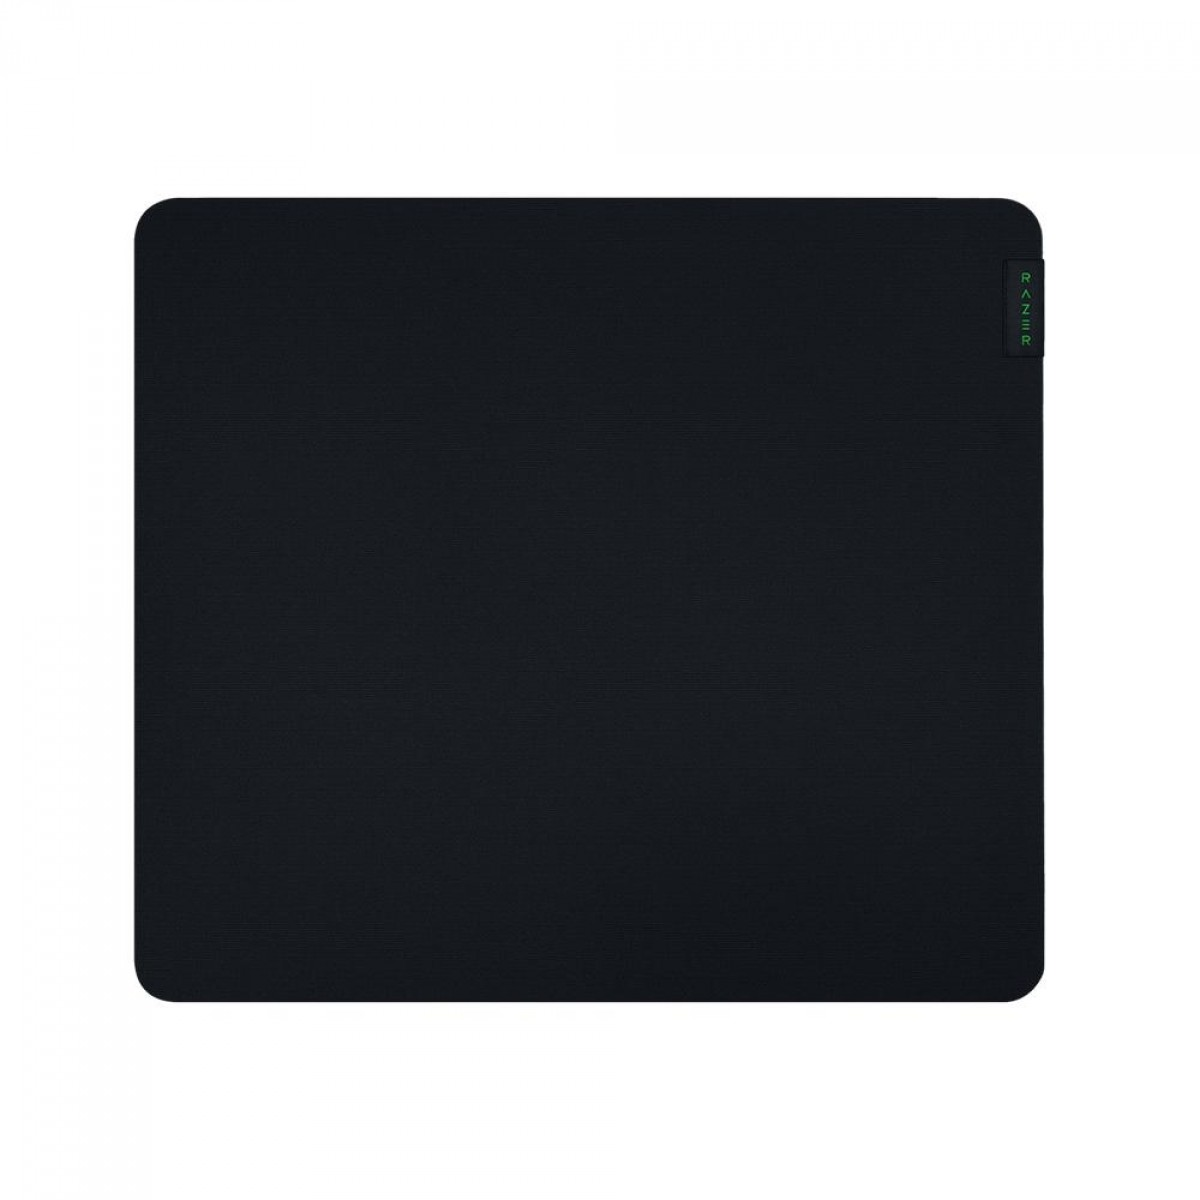 Mousepad Gamer Razer Gigantus V2, Control/Speed, Grande (450x400mm), RZ02-03330300-R3U1